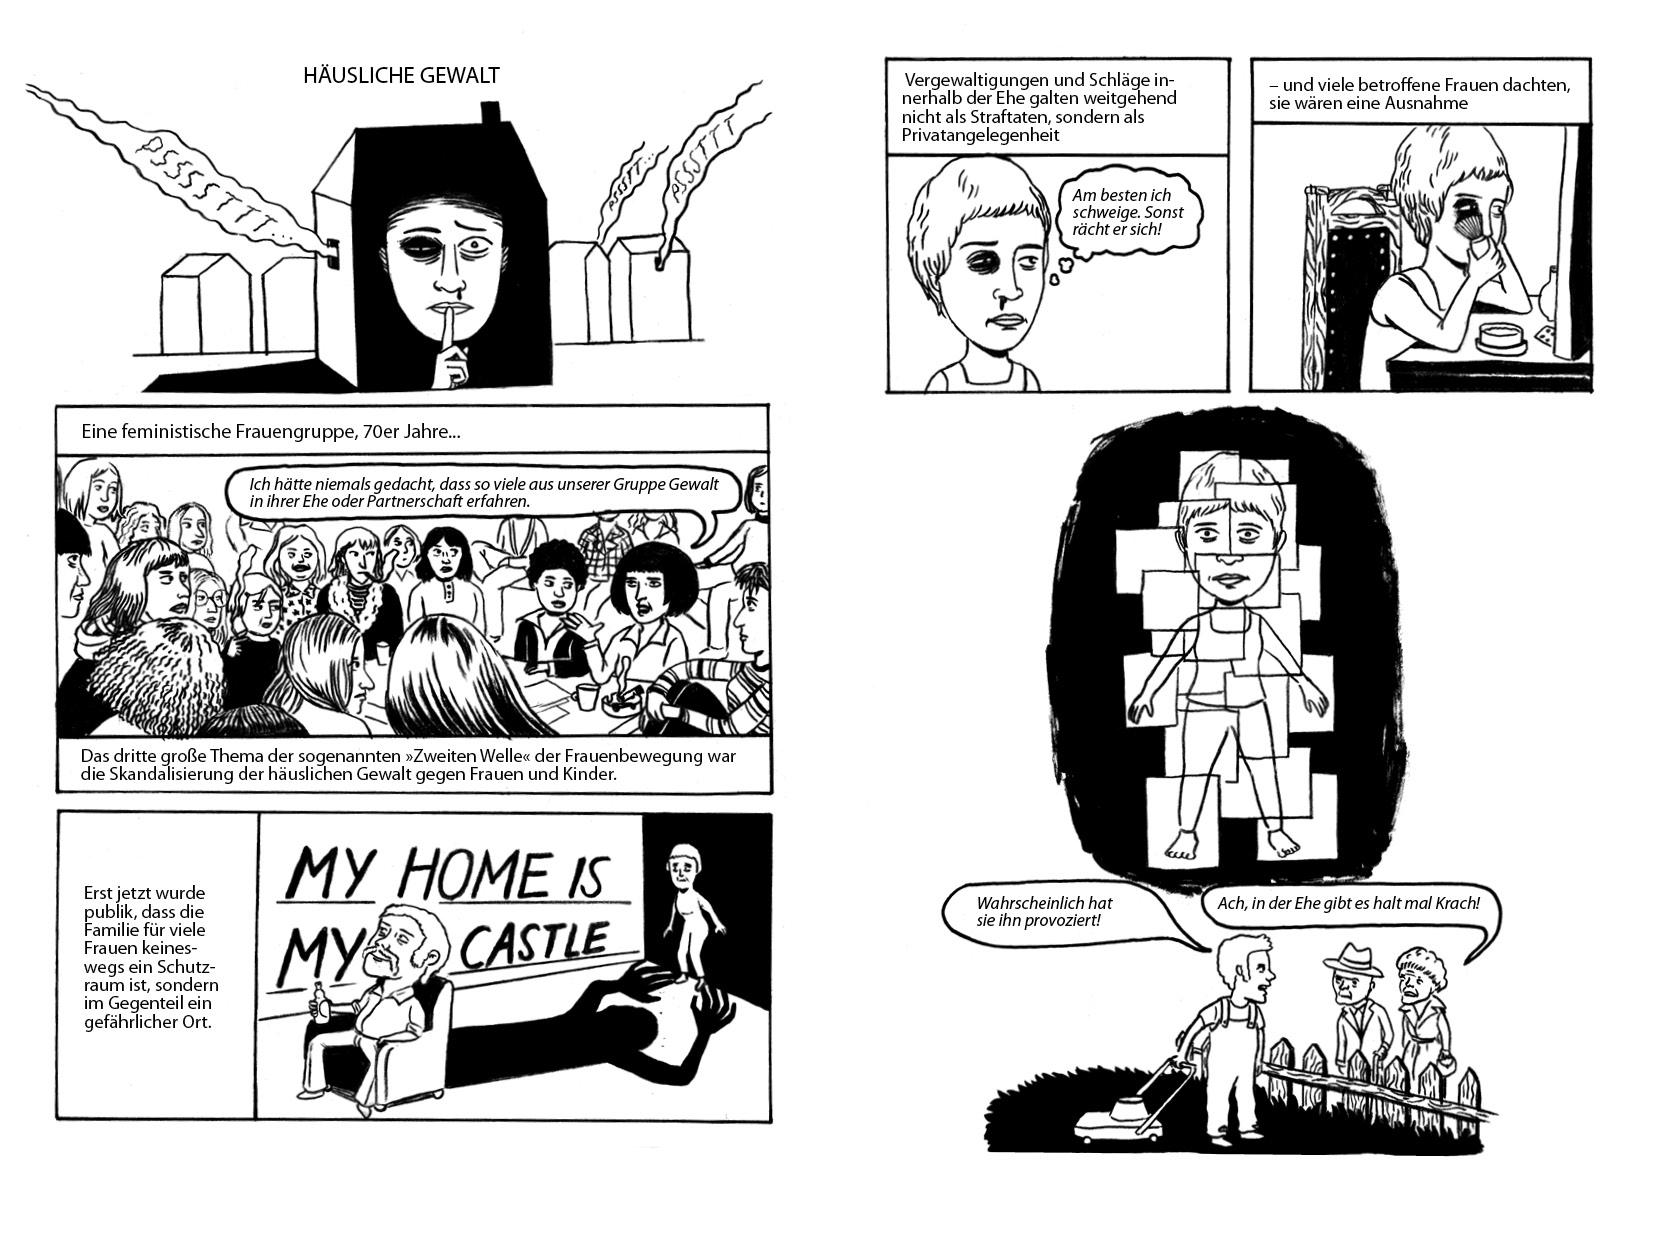 Feminismuscomic_homepage_56-57.jpg